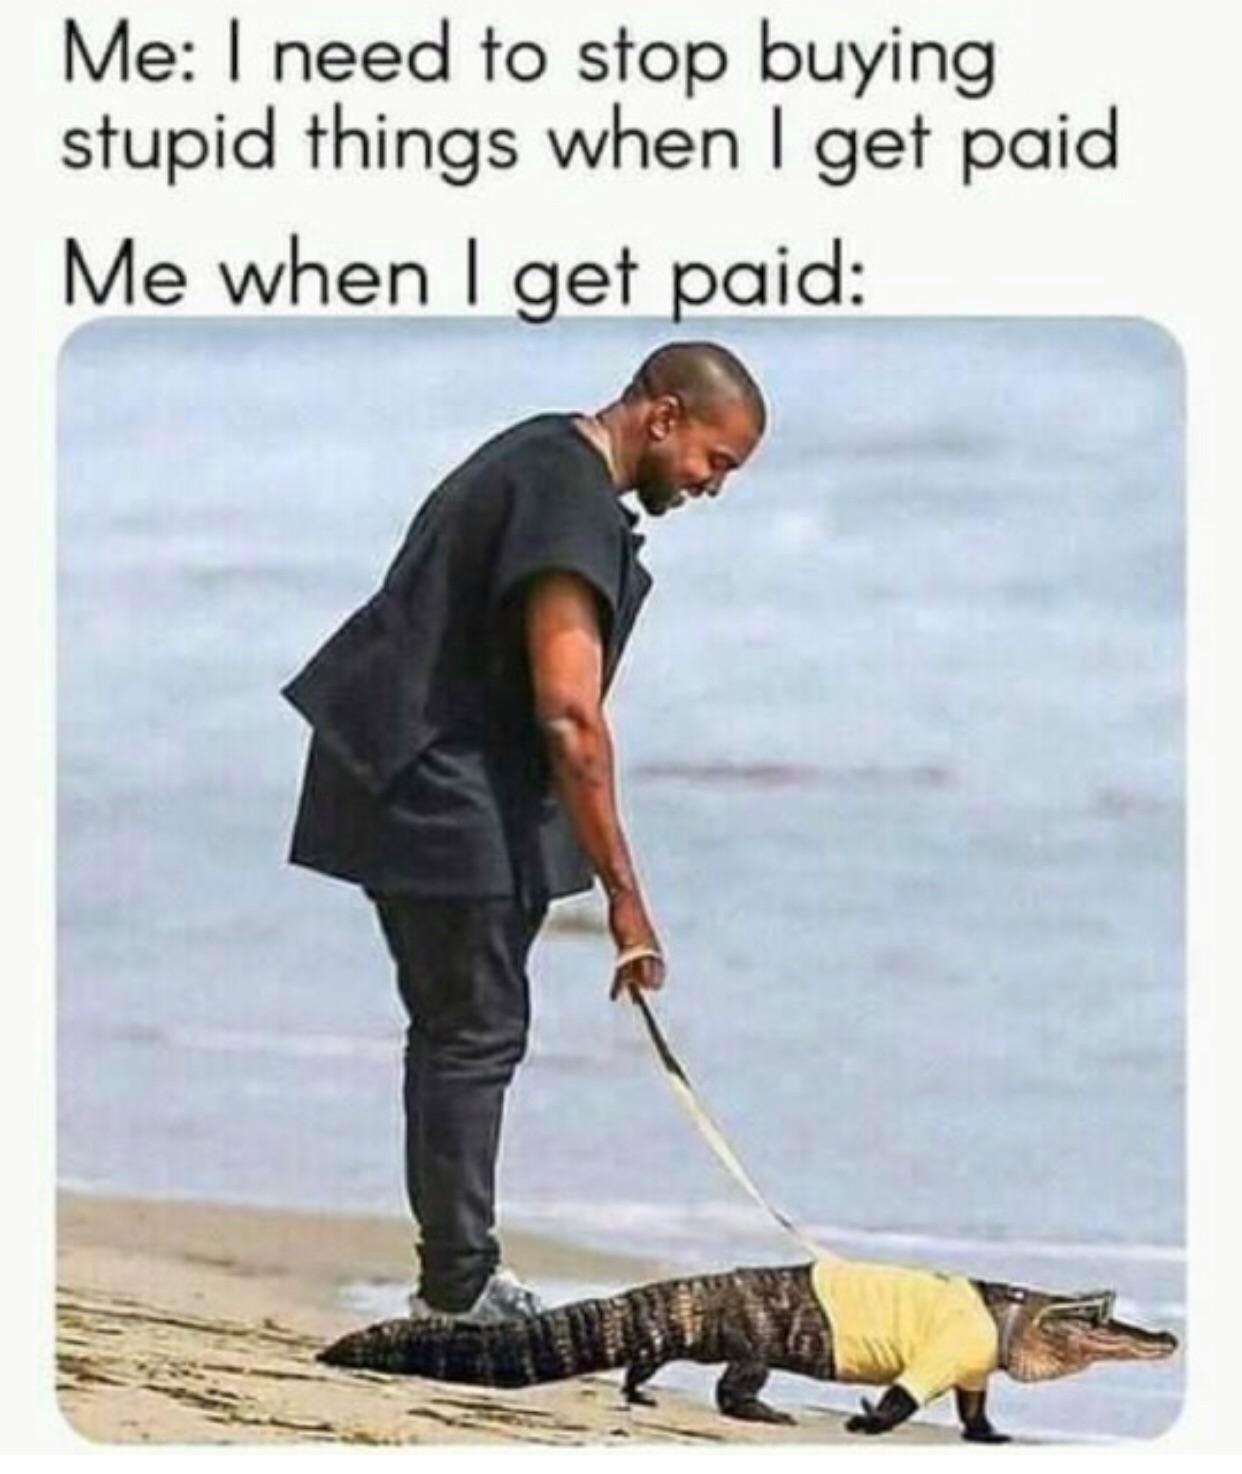 Gotta get that alligator. - meme